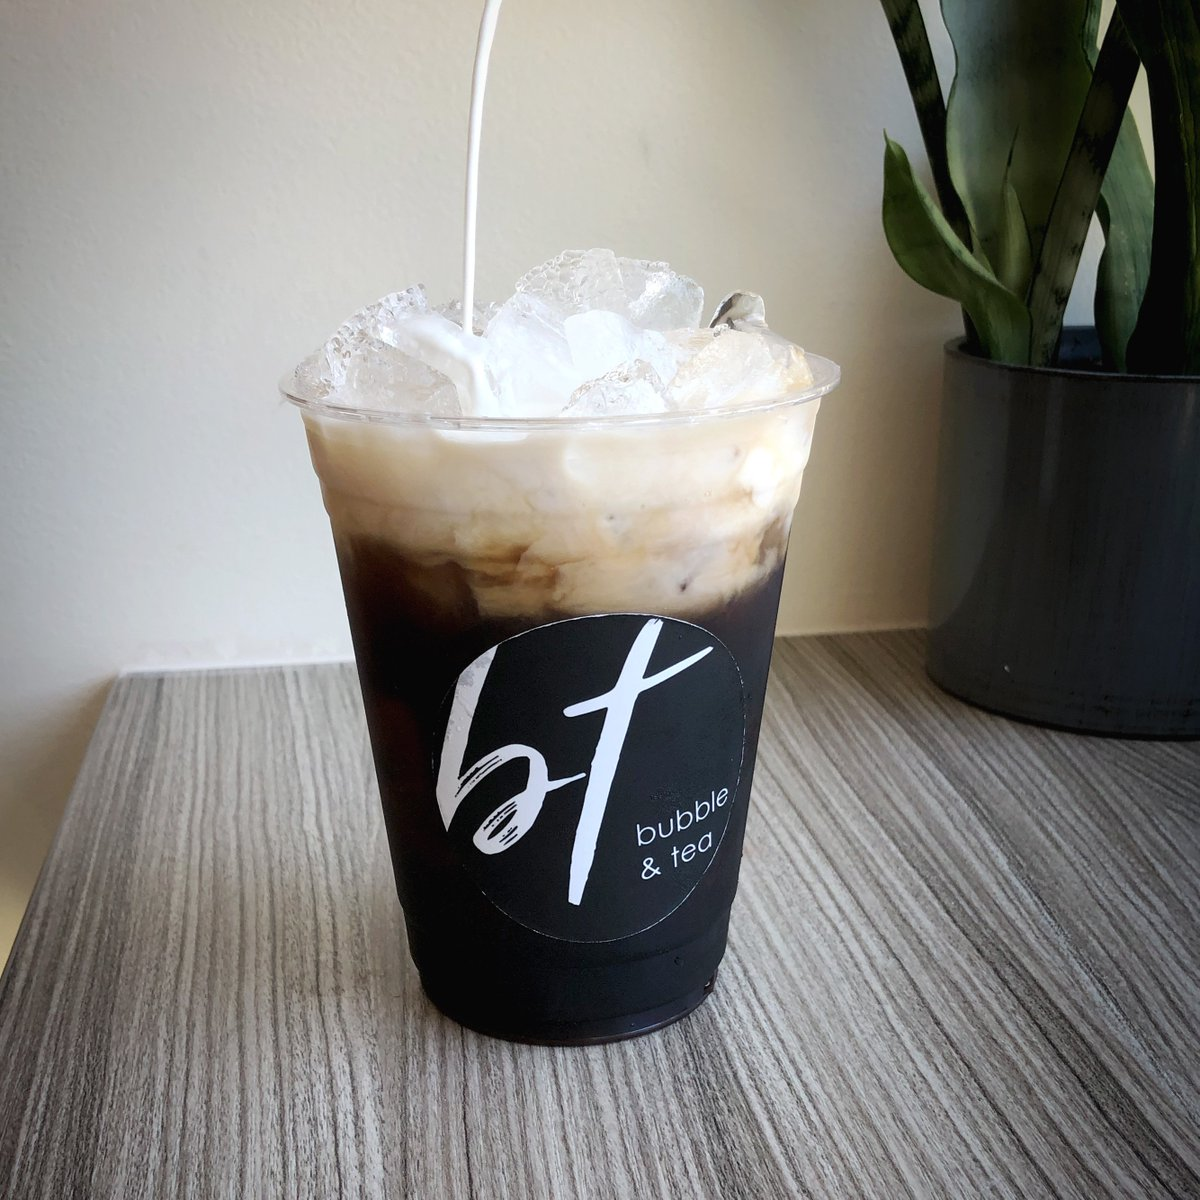 Cheers! 😁To being halfway through the week! #BubbleandTea #IcedCoffee . . . . #coffee #happy #milk #slush #smoothie #fresh #food #lafoodie #eeeeeats #foodie #nomnomnom #fresh #drinks #boba #dessert #bubblewaffle #sweet #arcadia